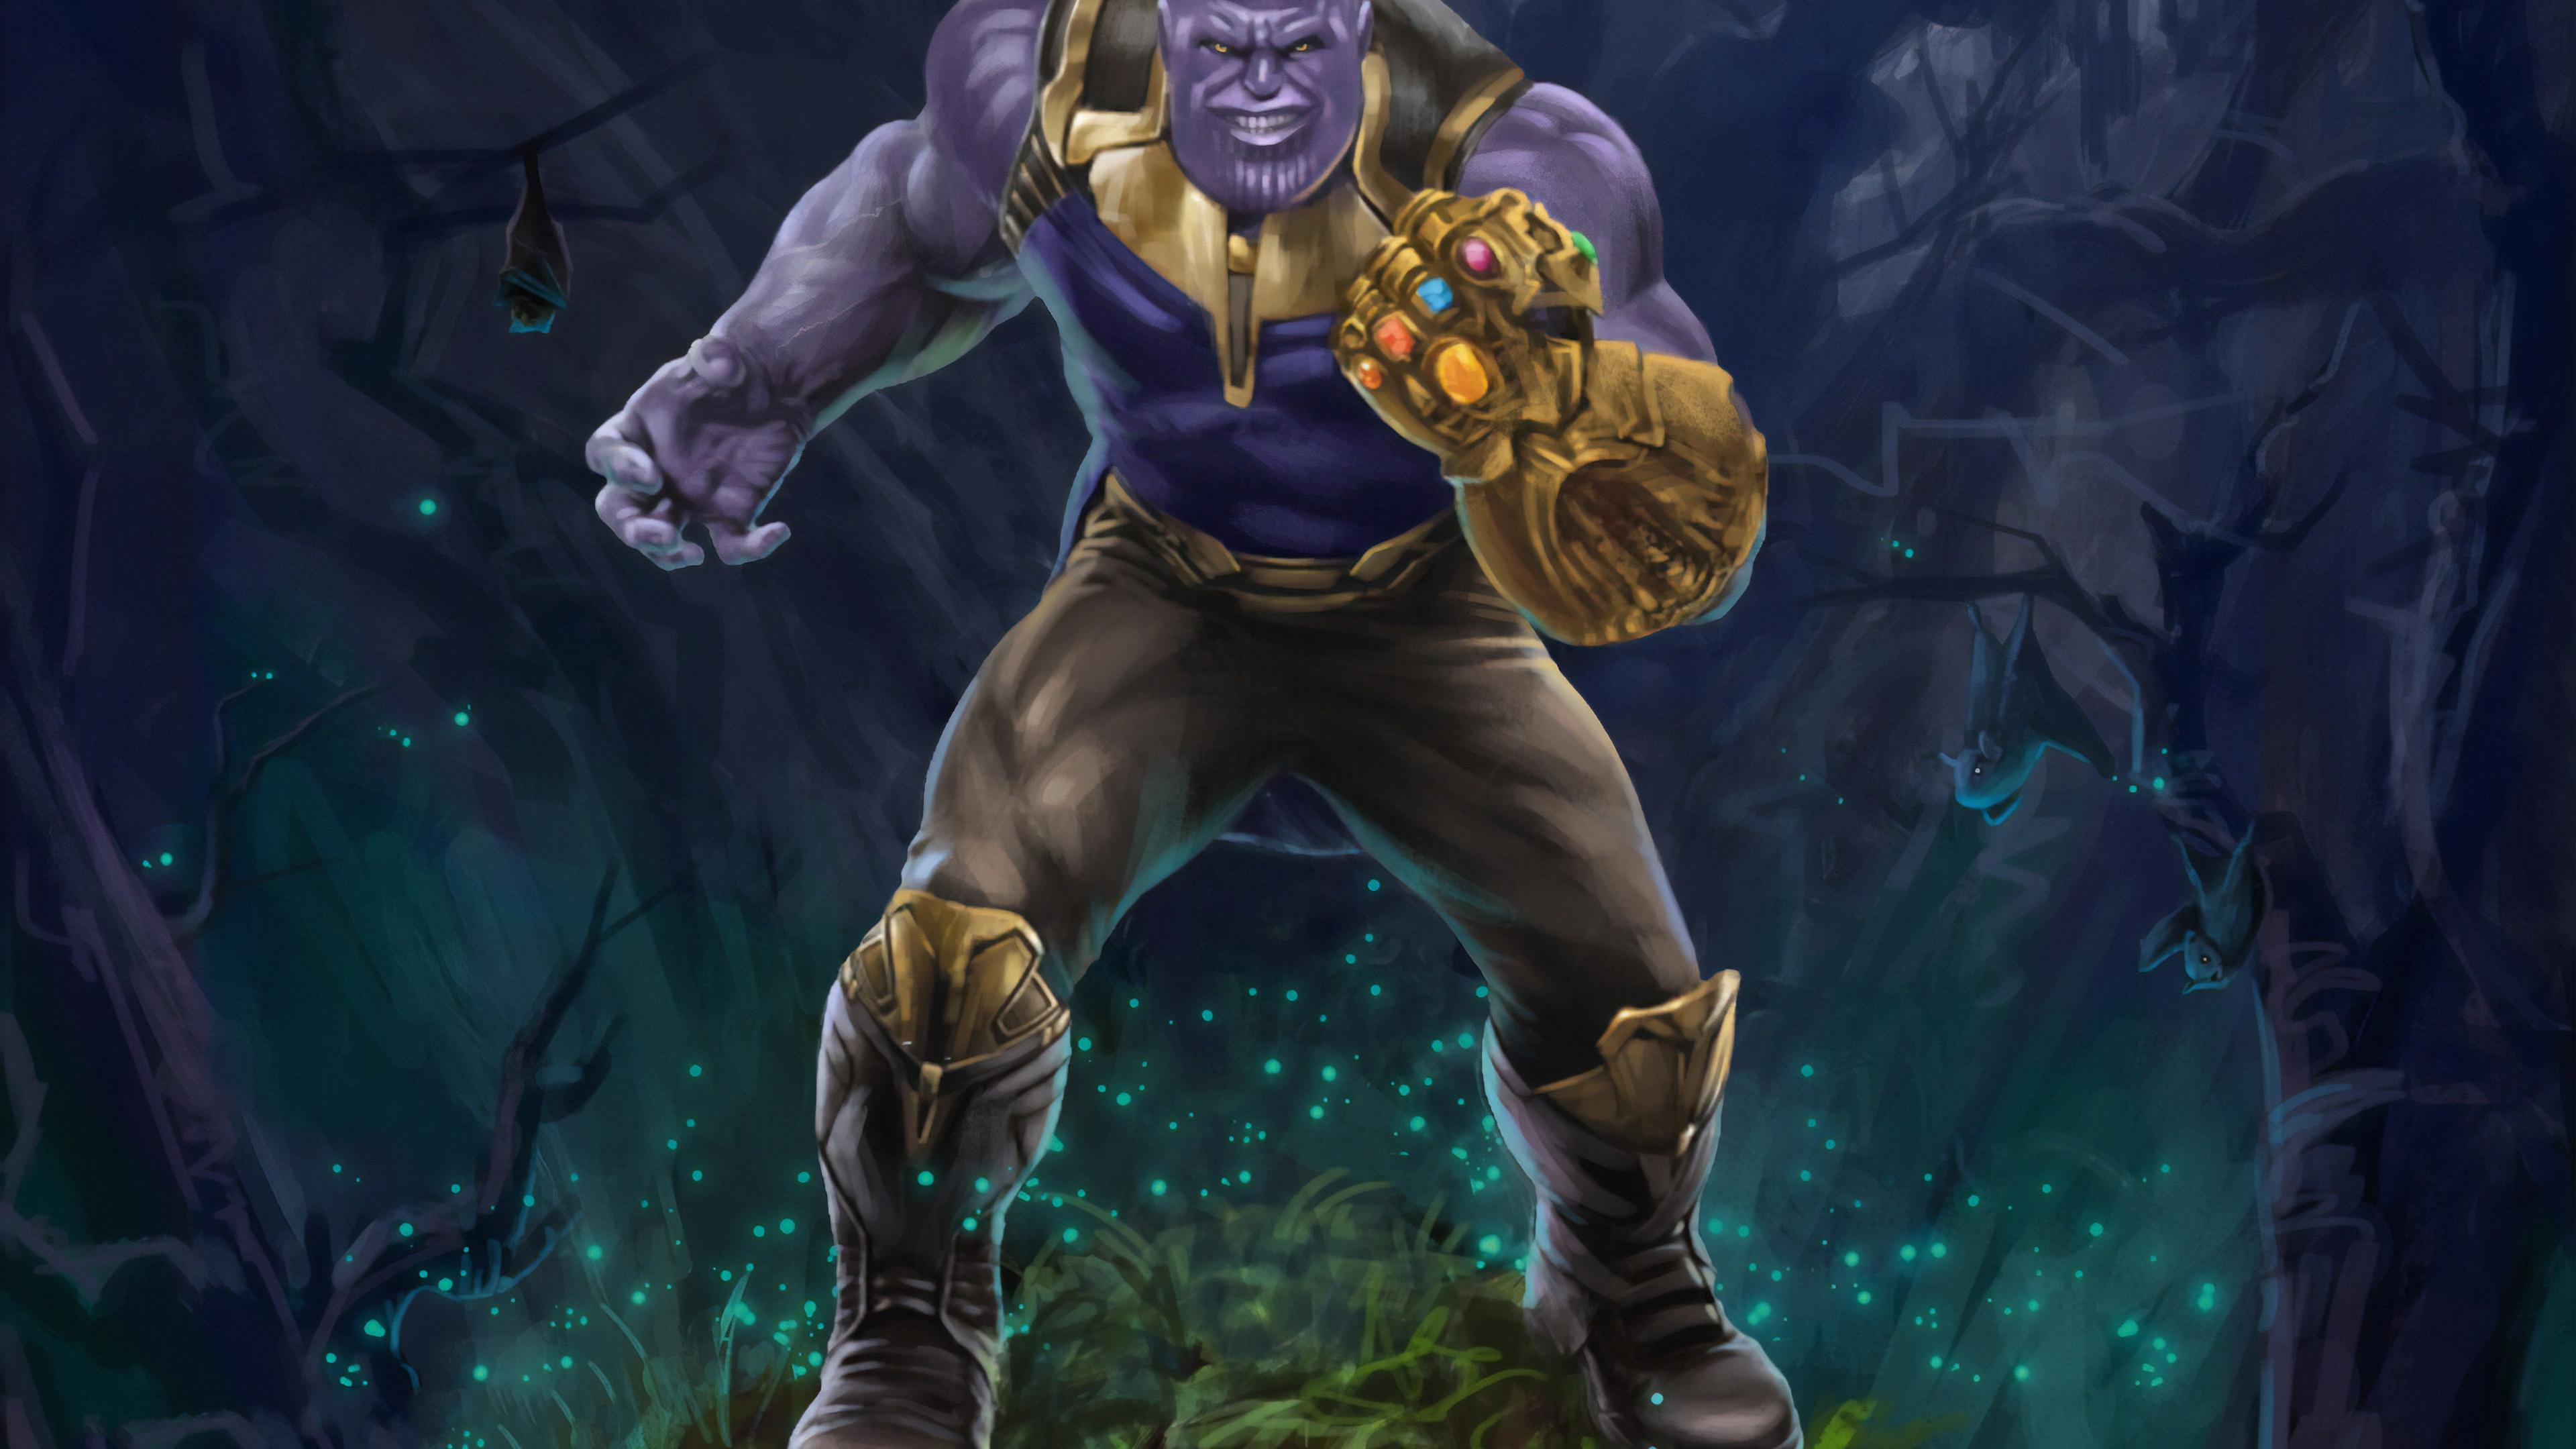 thanos 2019 new 1569186878 - Thanos 2019 New - thanos-wallpapers, superheroes wallpapers, hd-wallpapers, digital art wallpapers, artwork wallpapers, artstation wallpapers, 4k-wallpapers